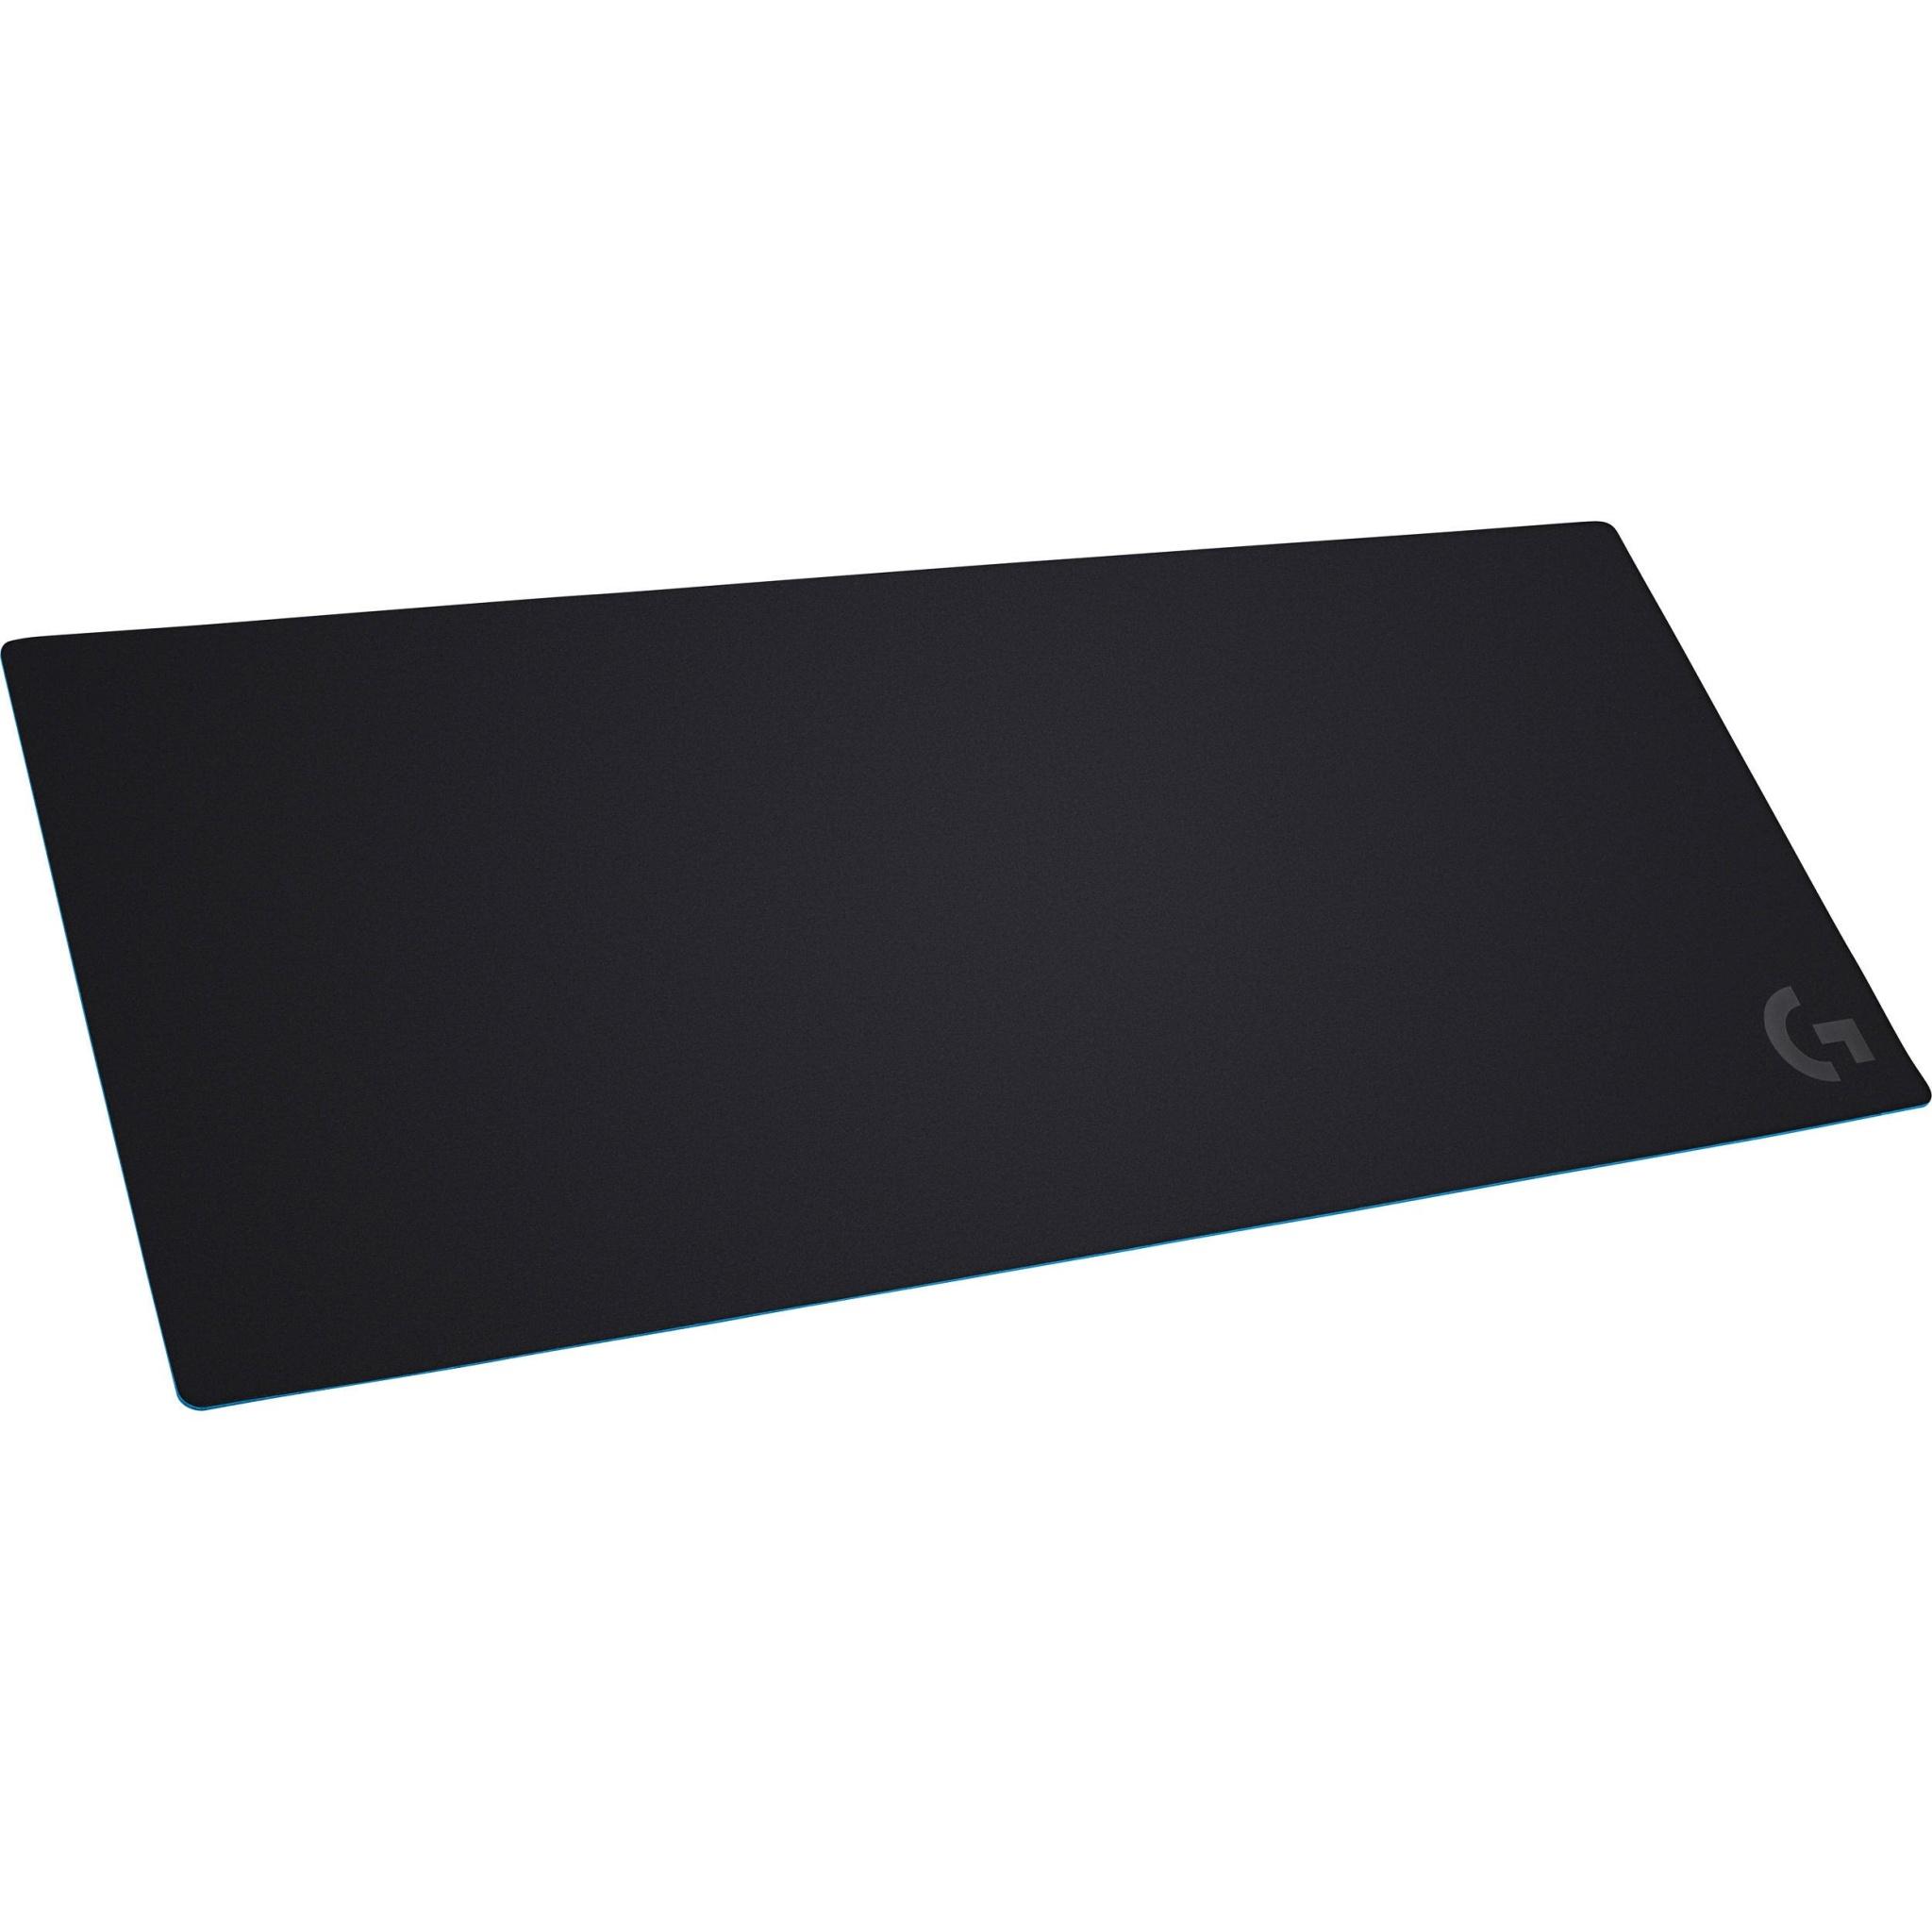 /Mouse Pad Logitech G840/Rubber Black/ Black, White, 400/mm, 900/mm, 3/mm